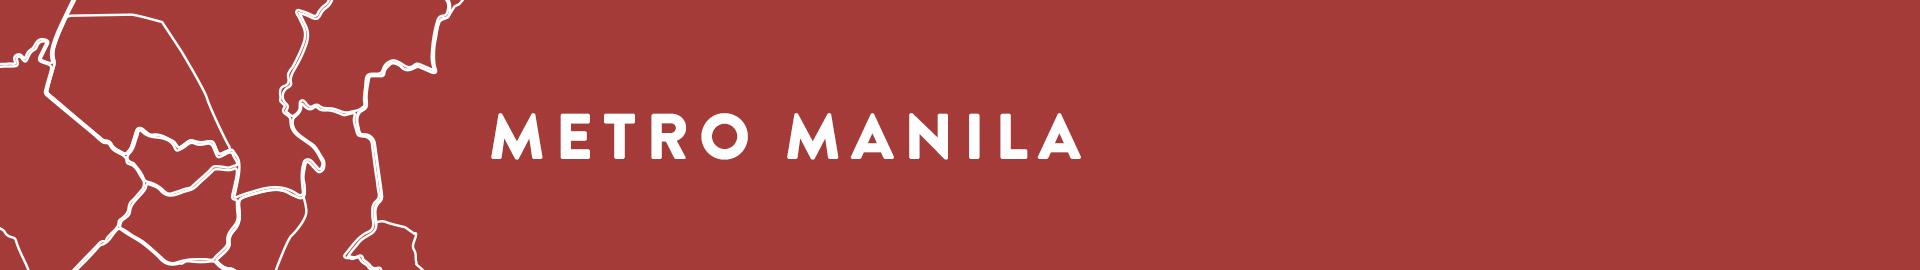 Love the City_Design_Per City_Metro Manila